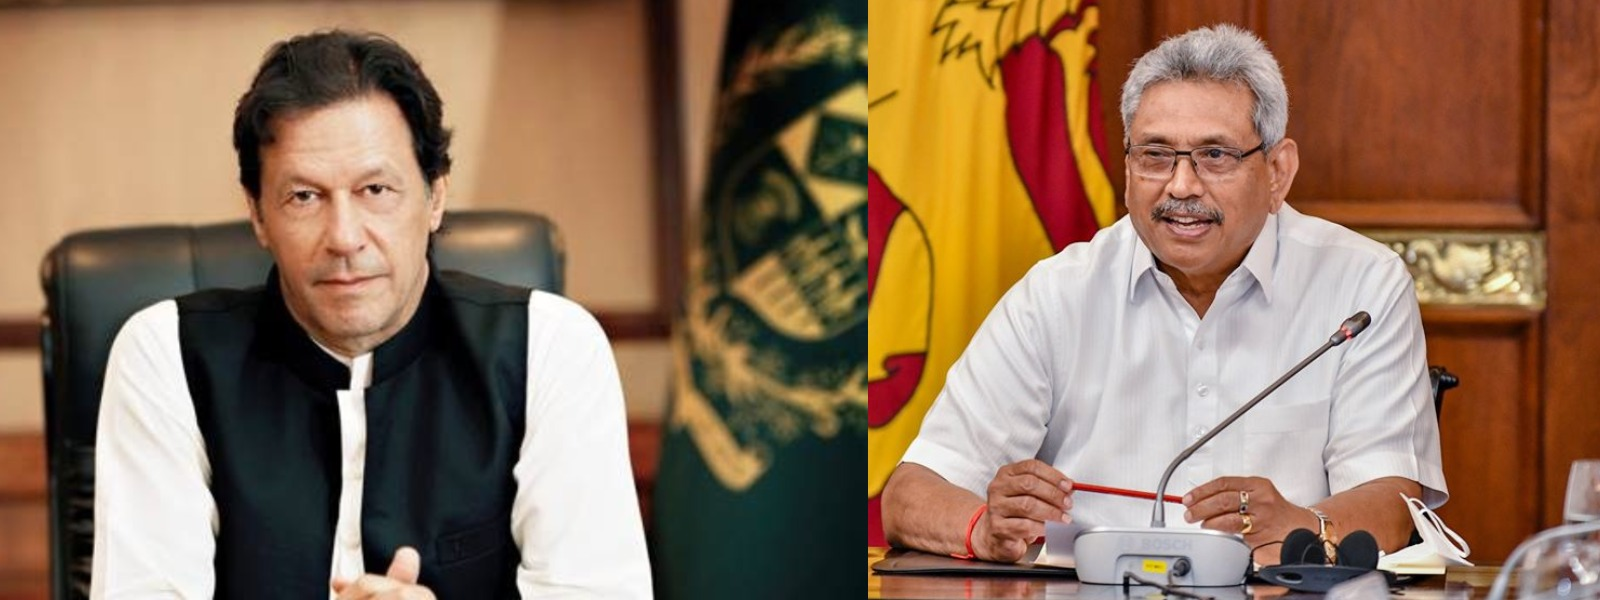 Pakistan PM Khan commend Sri Lanka's efforts to combat COVID-19